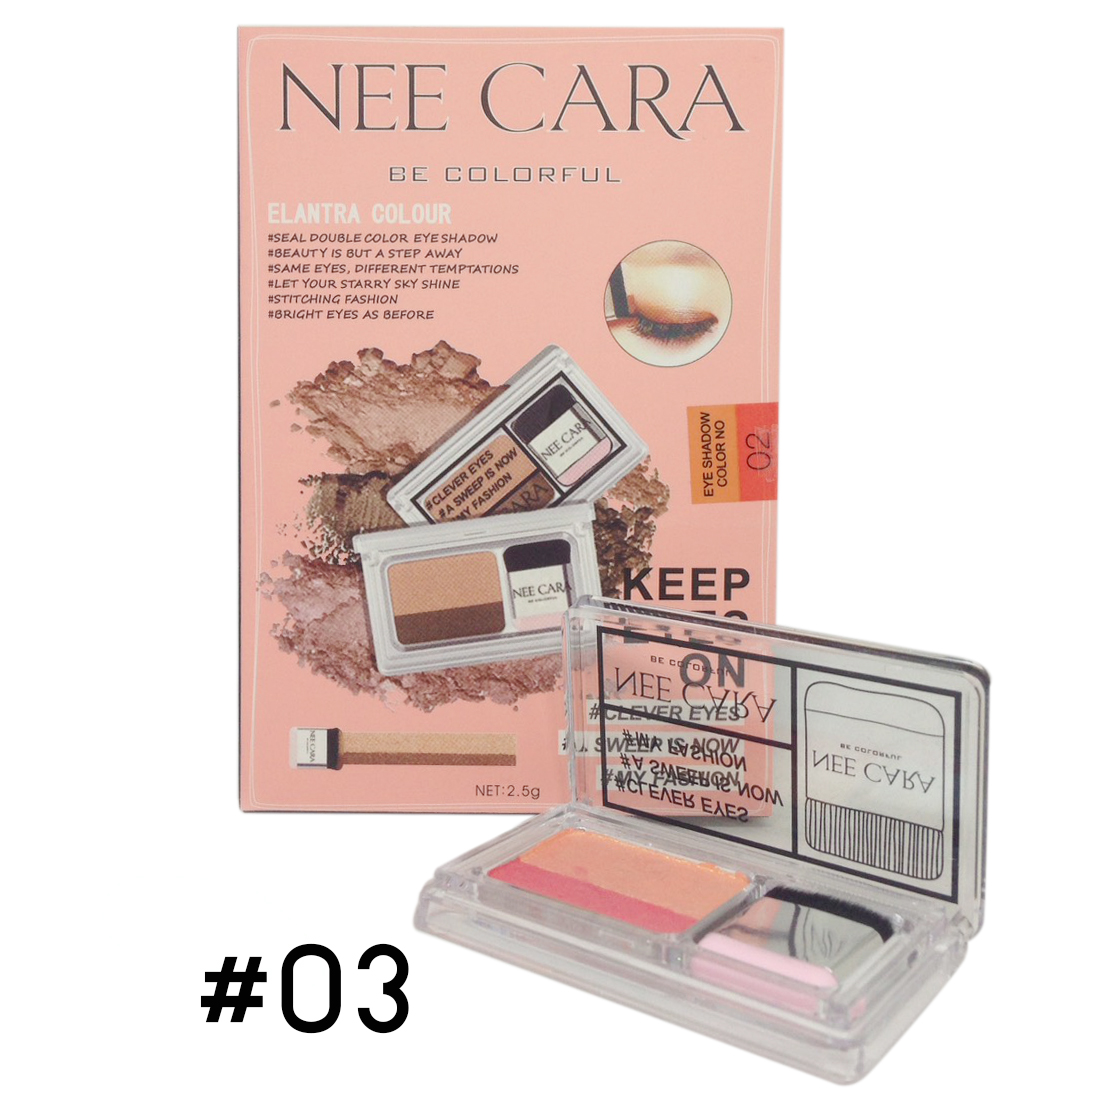 Nee cara Seal Double Color Eyeshadow อายแชโดว์ แมกกาซี ของนีคาร่า No.03